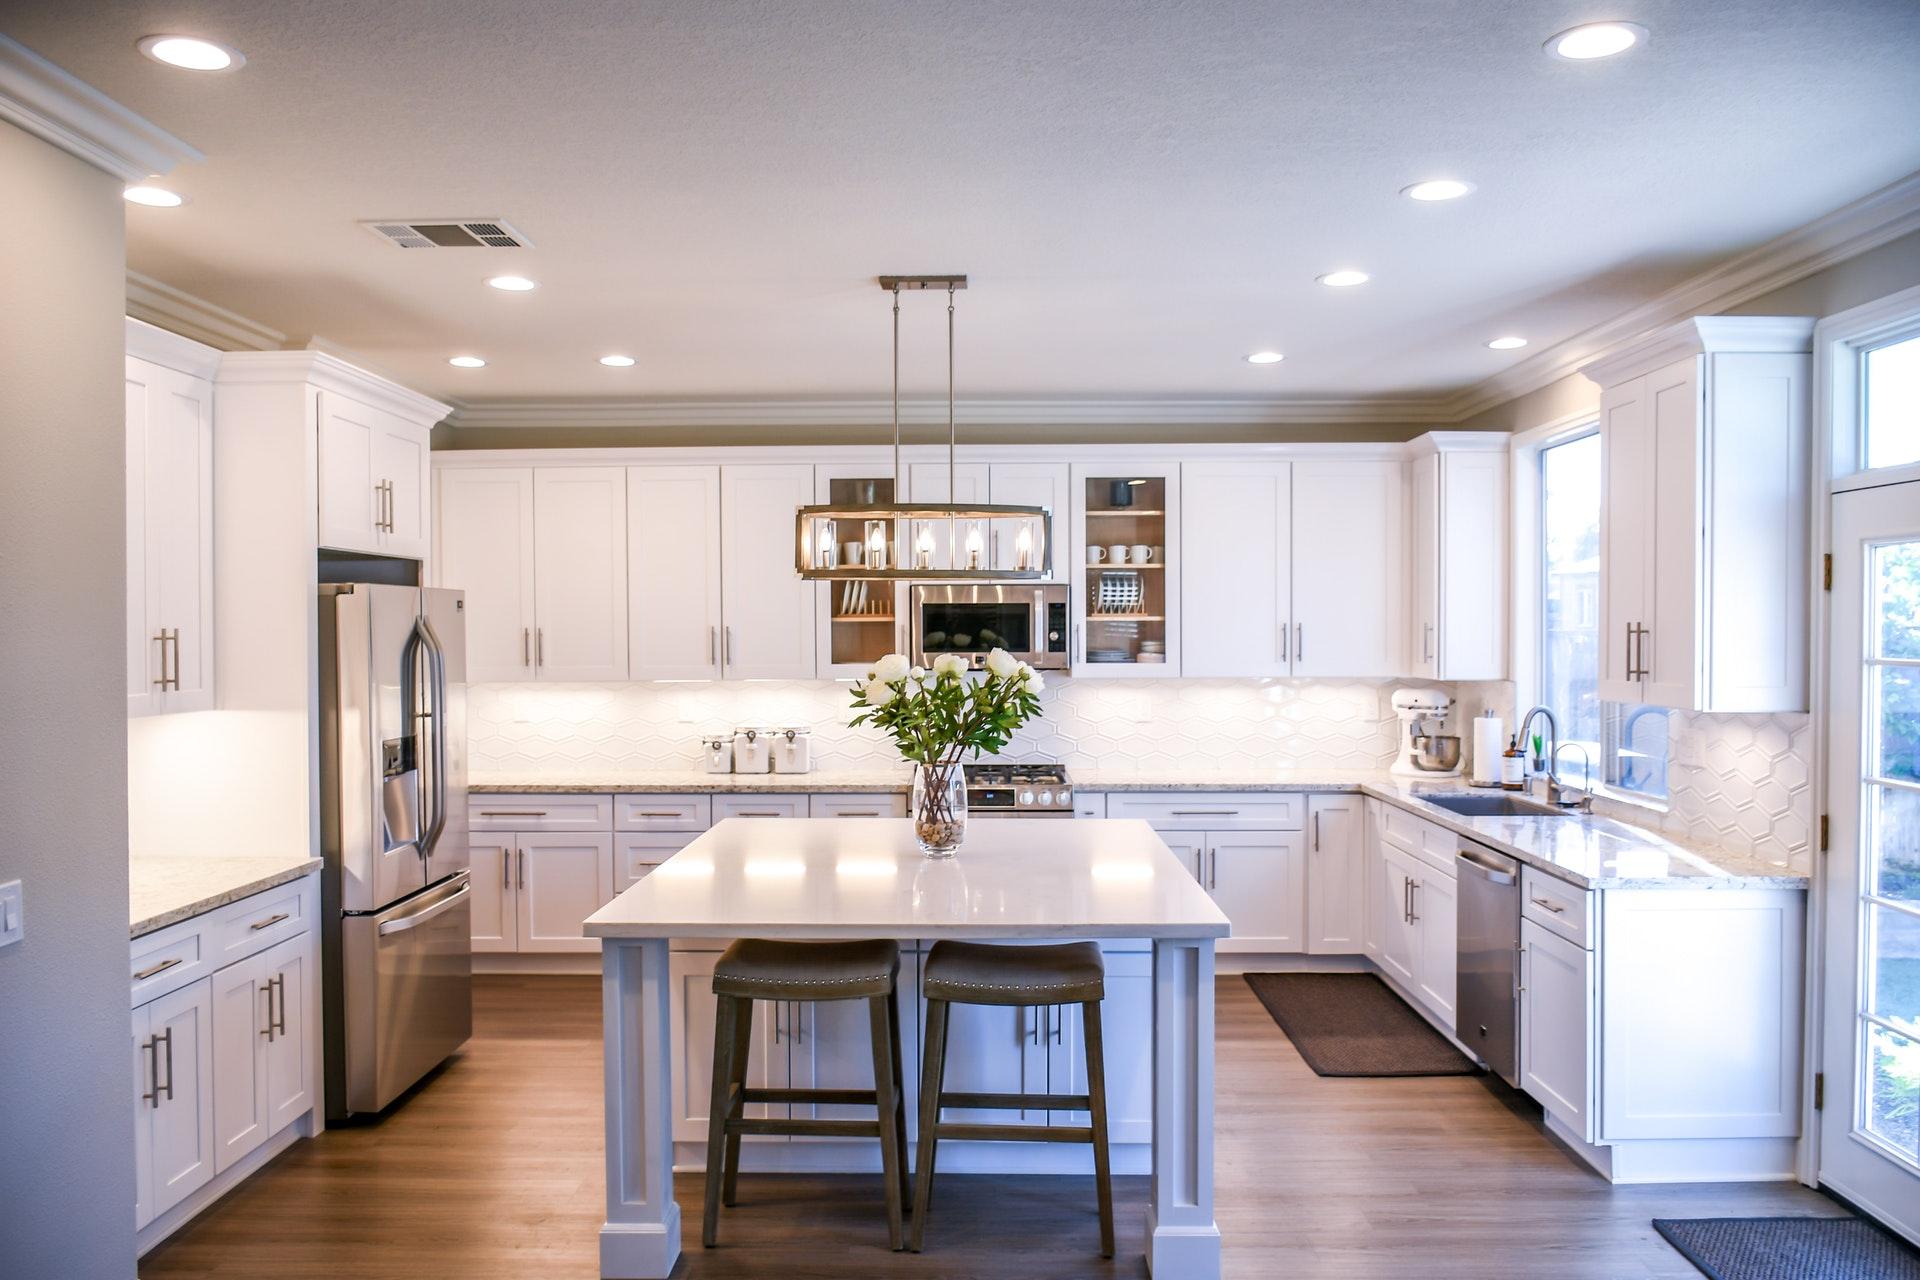 How to Install LED Under Cabinet Lighting – Shabby Chic Boho